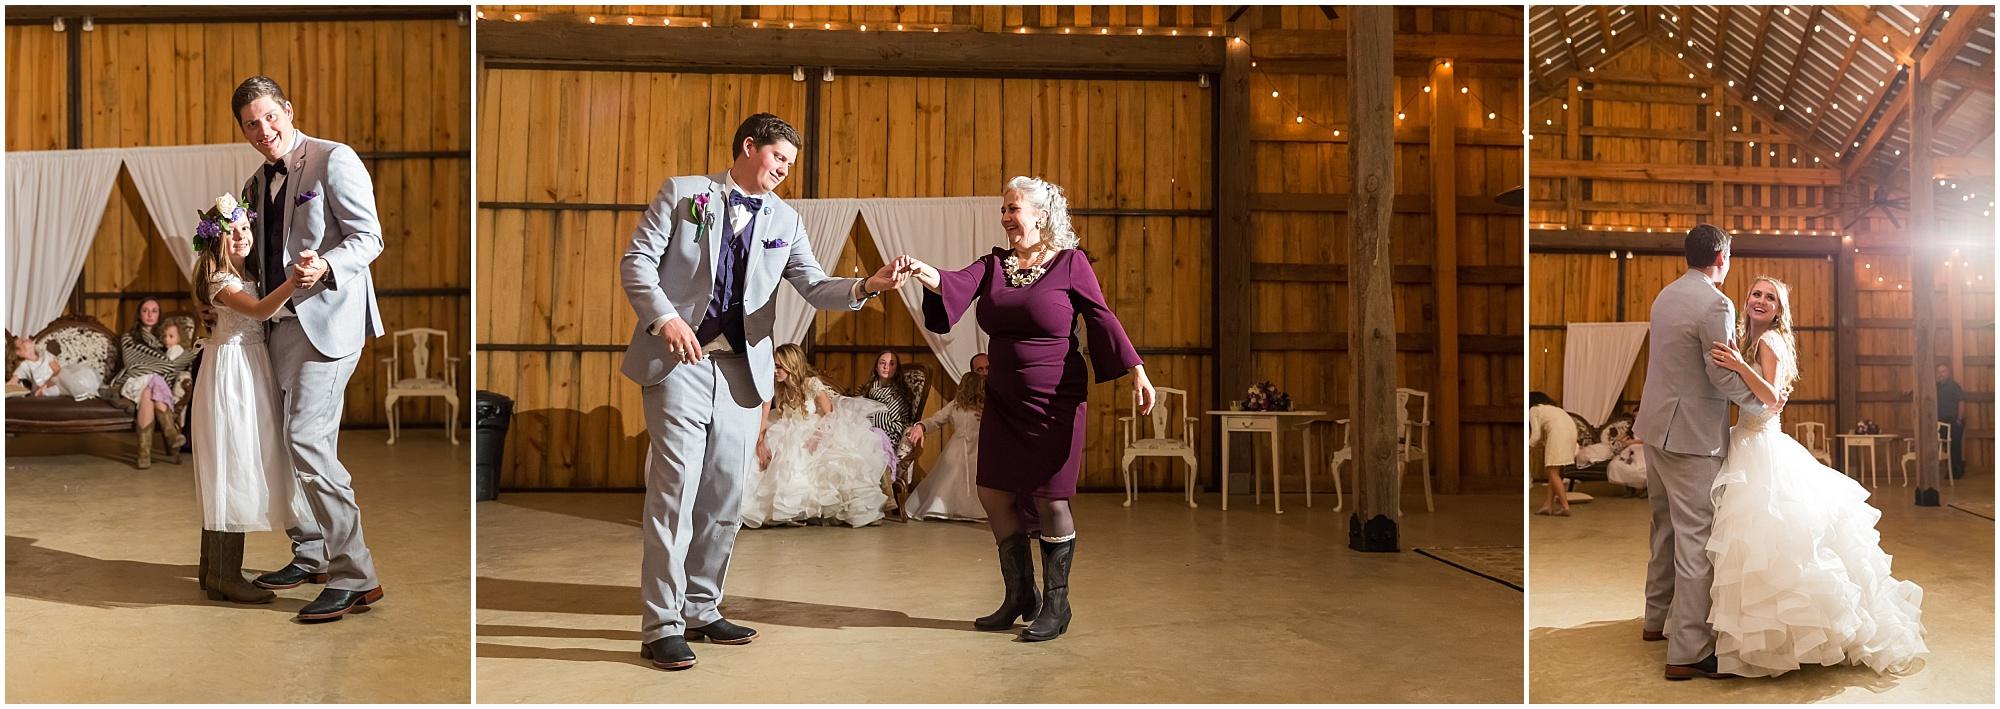 Disney-Inspired-Wedding-Central-Texas_0067.jpg